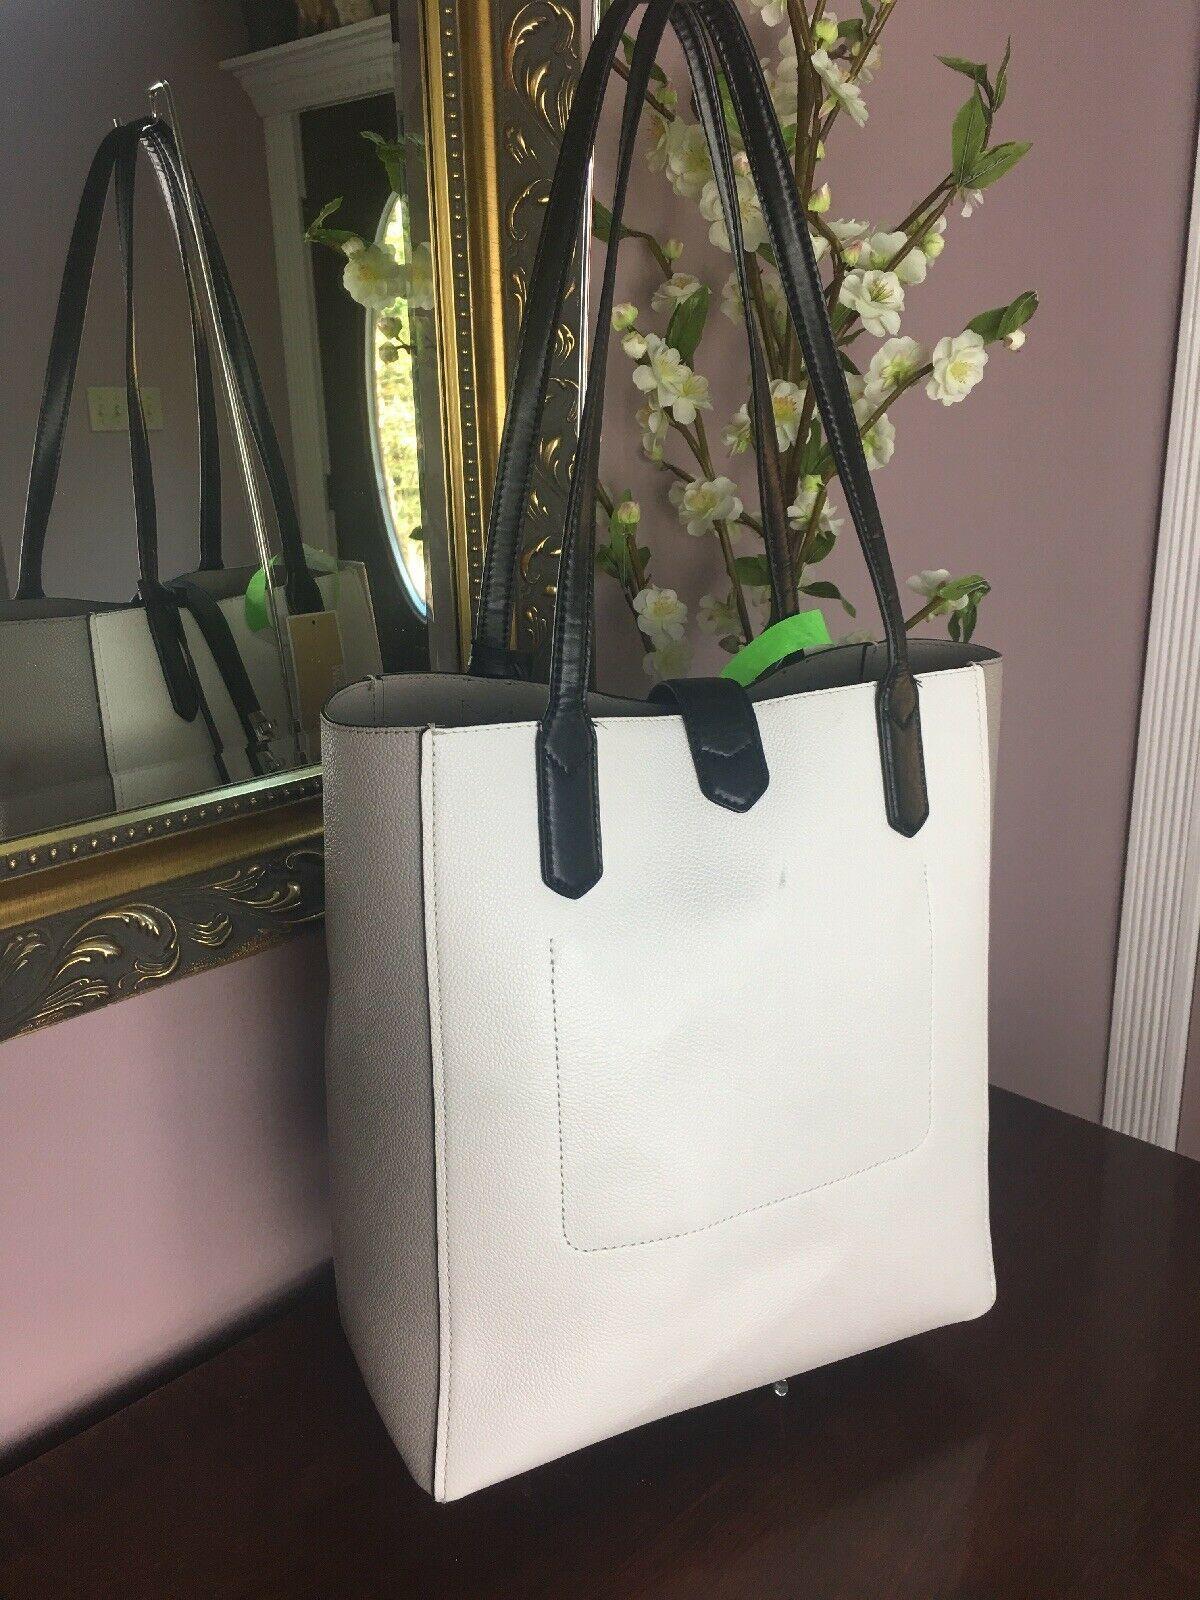 Michael Kors Bag Cassie Tote Medium NS Tote Leather White Gray Black B2R image 2